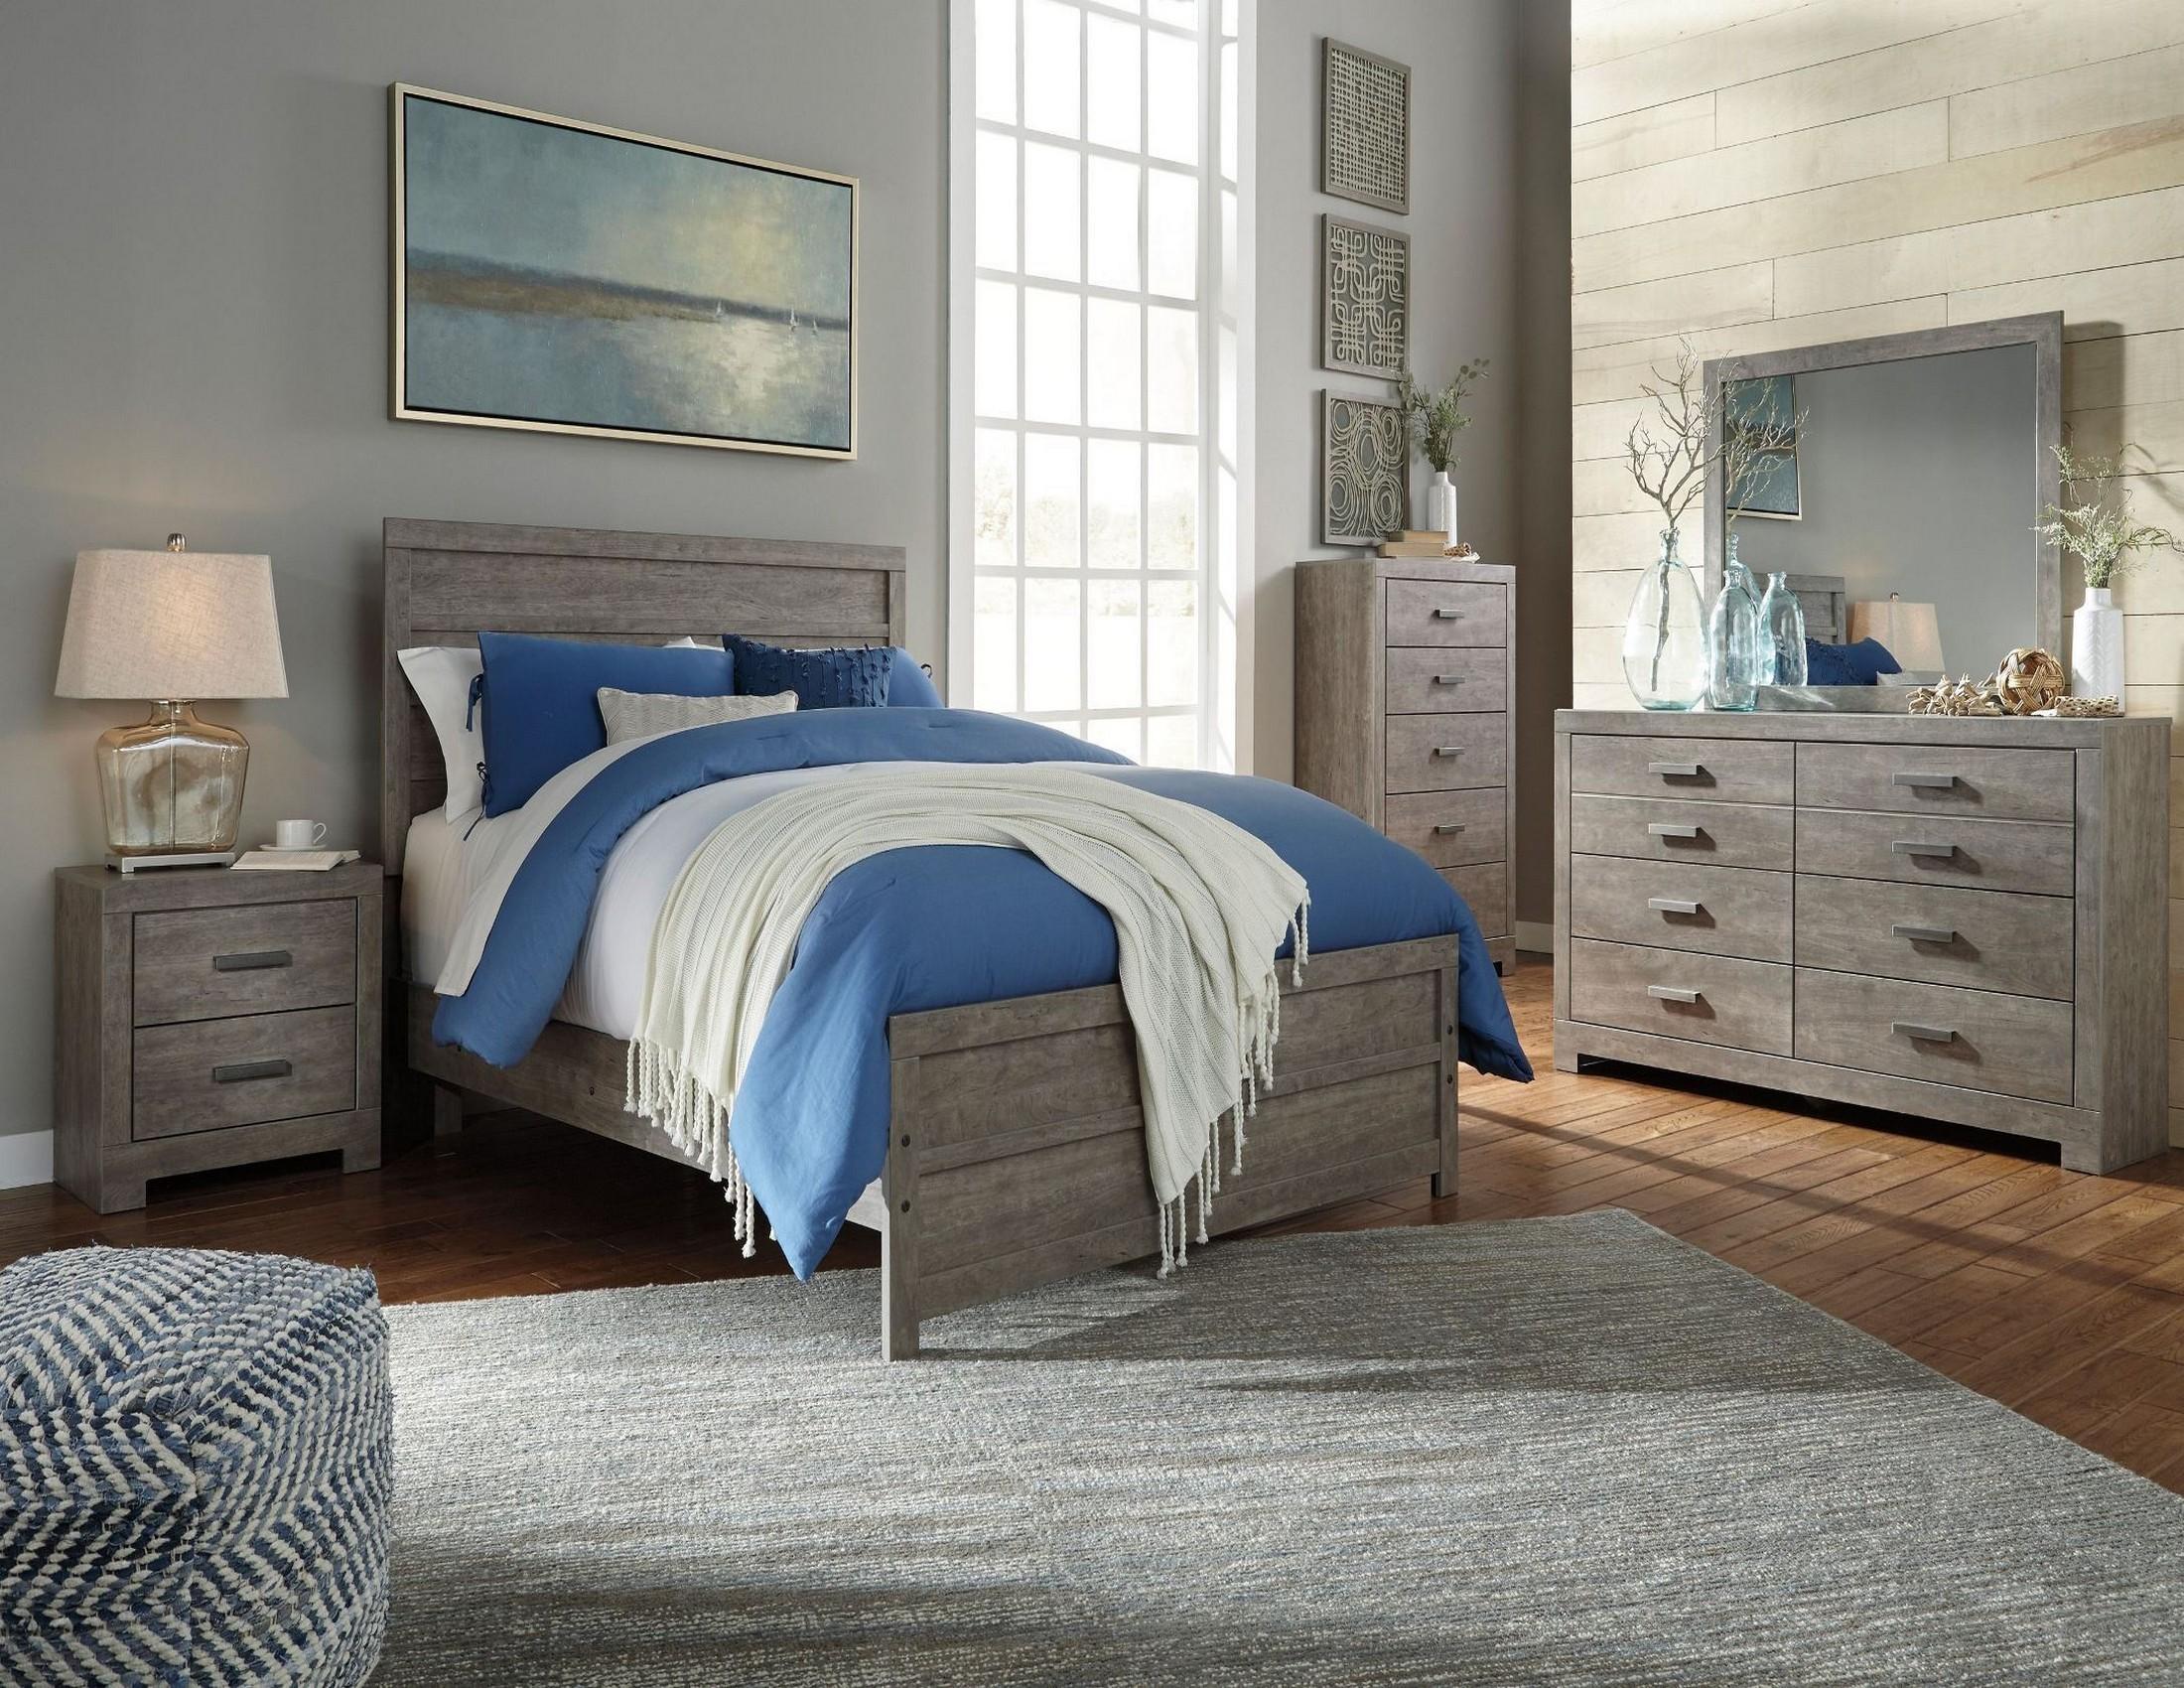 culverbach panel bedroom set from ashley coleman furniture. Black Bedroom Furniture Sets. Home Design Ideas